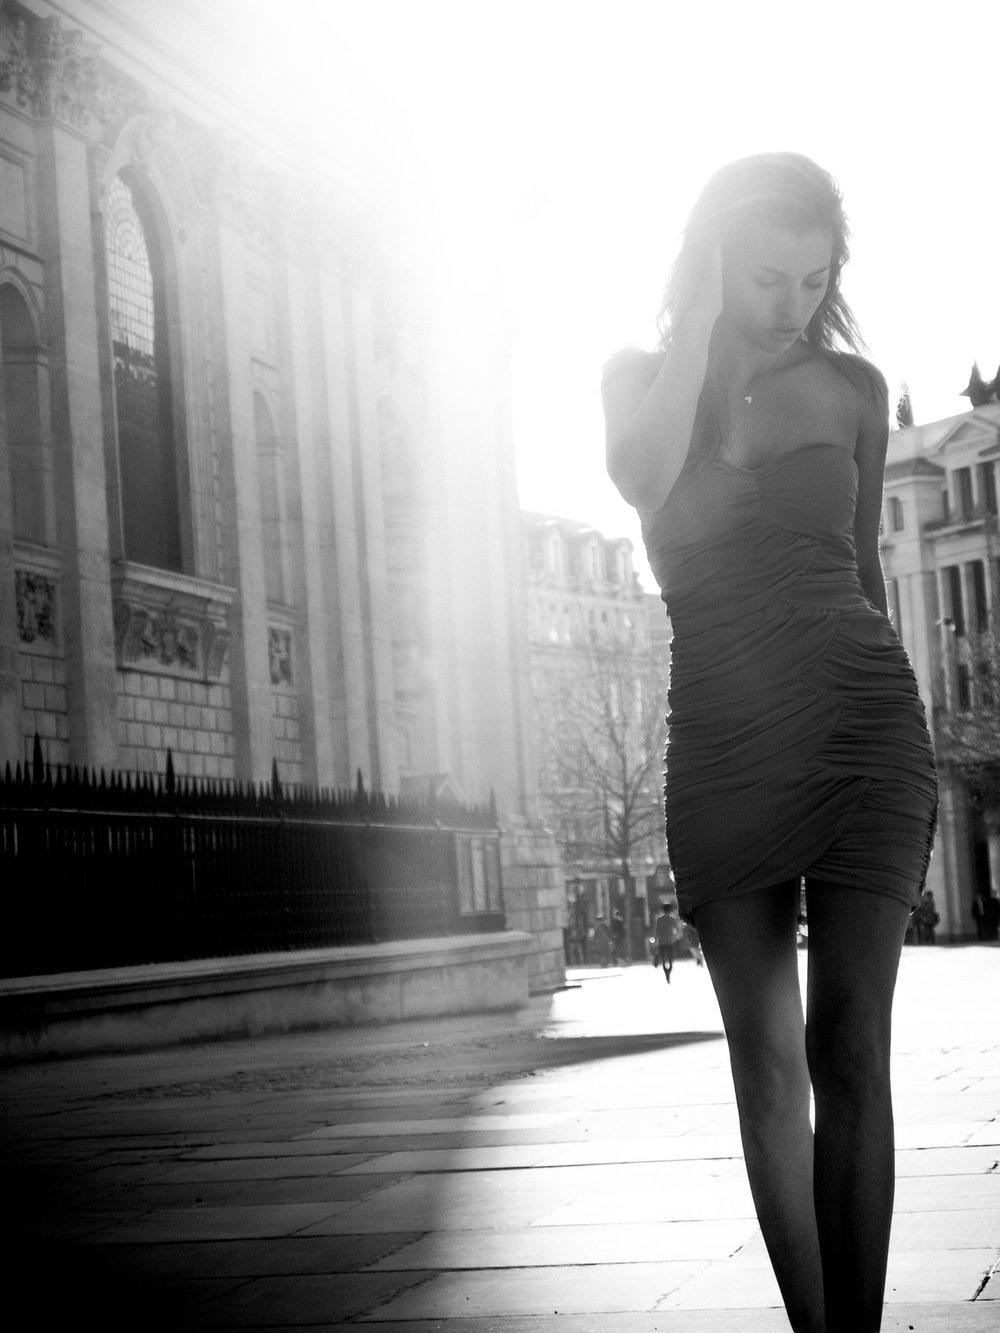 Shot on Olympus PEN E-PL1 (2012)